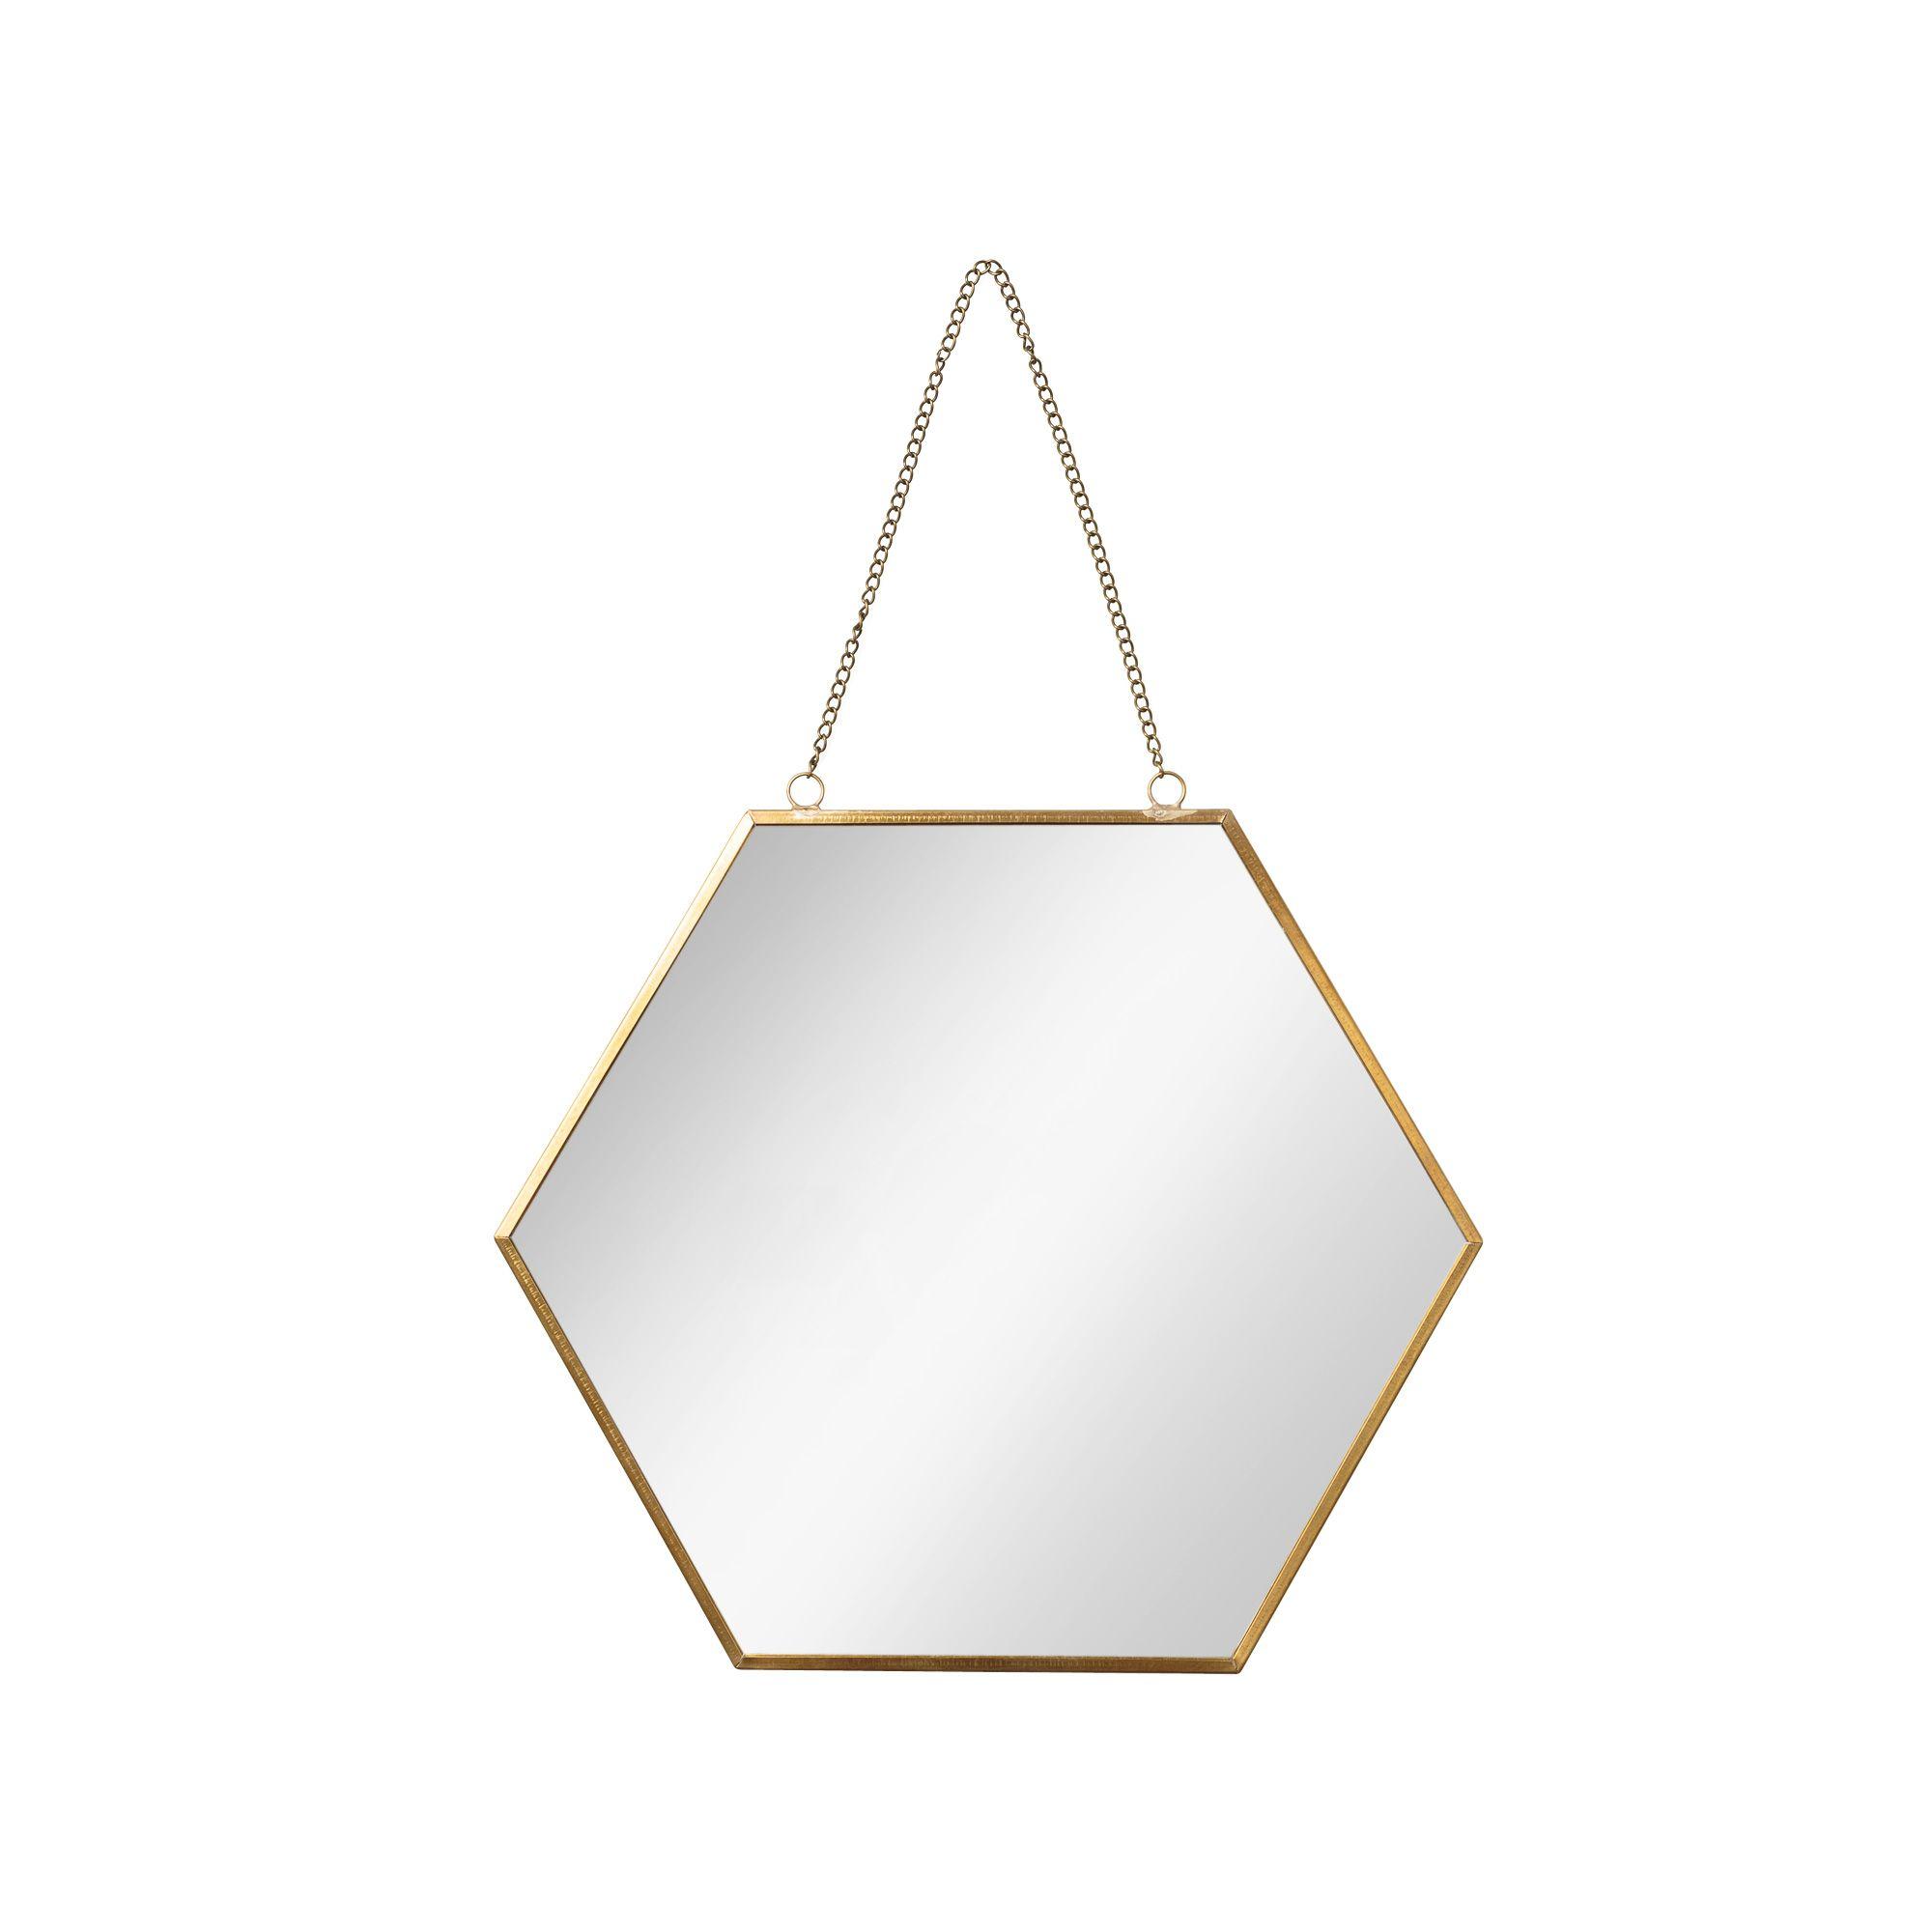 Buy the Small Gold Hexagon Mirror at Oliver Bonas. Enjoy free UK ...